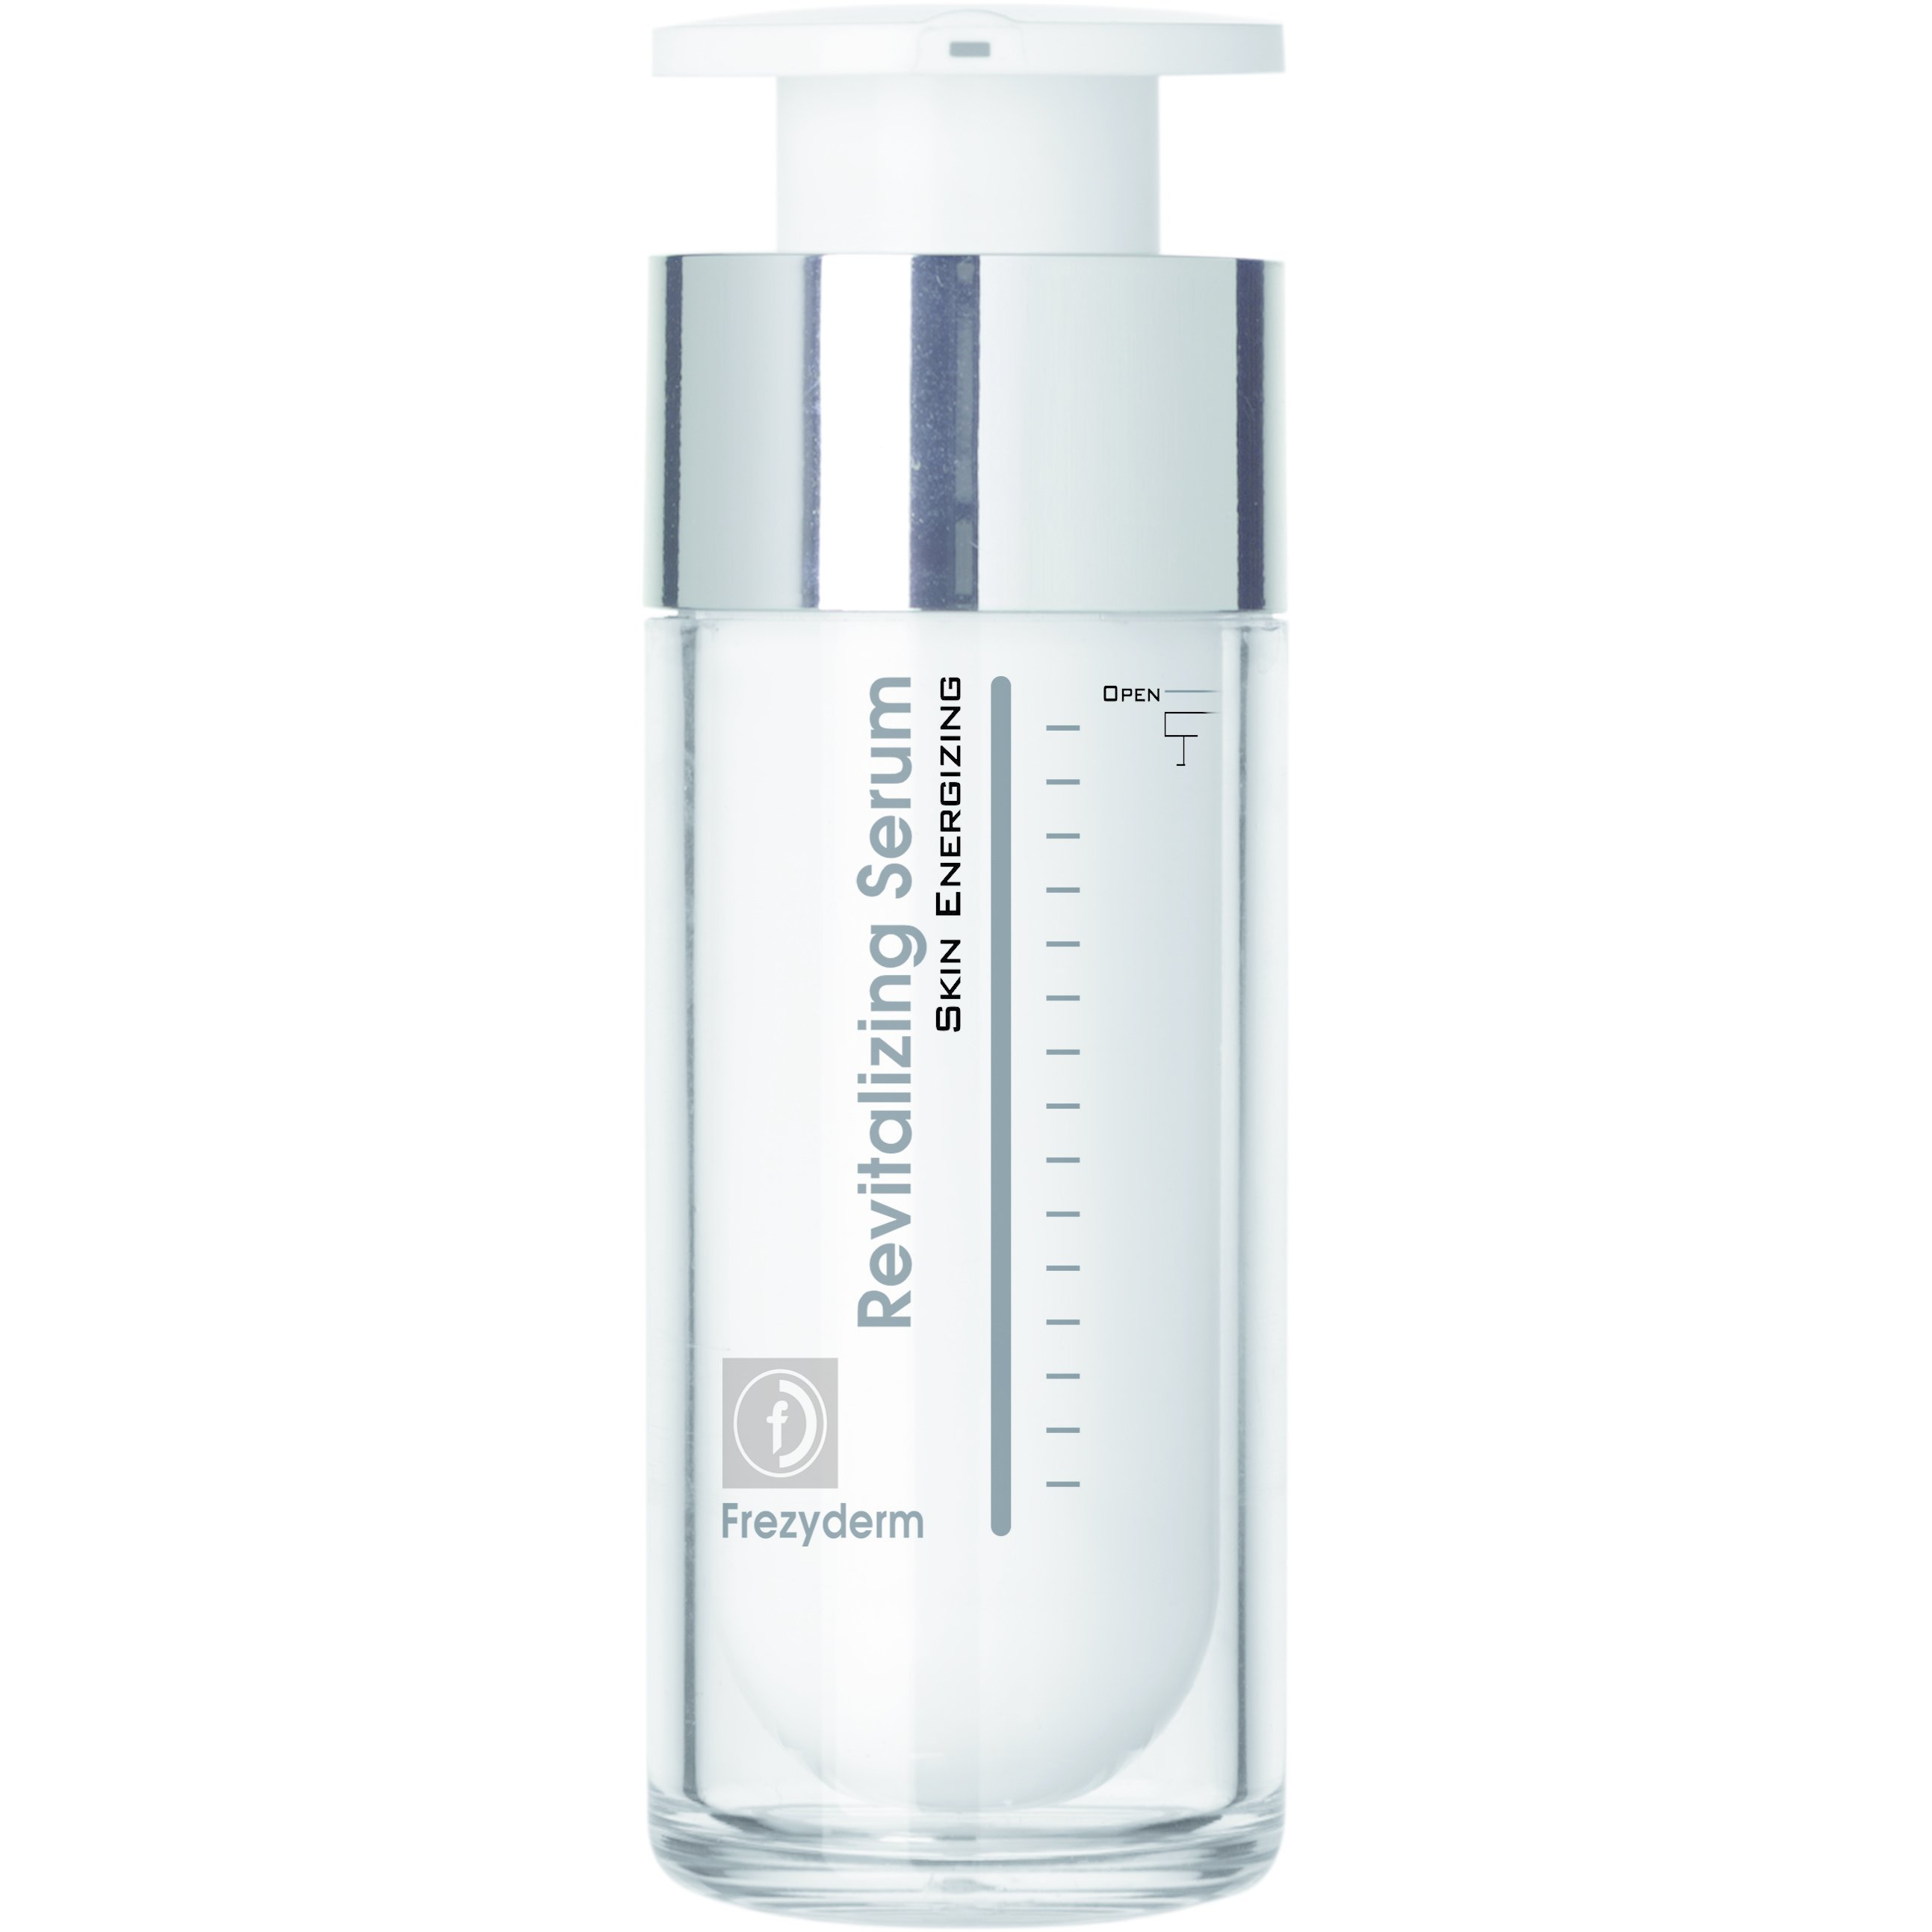 Frezyderm Revitalizing SerumΟρός Αντιγήρανσης & Αναζωογόνησης 30ml ομορφιά   αντιγήρανση και σύσφιξη προσώπου   serum αντιγήρανσης προσώπου